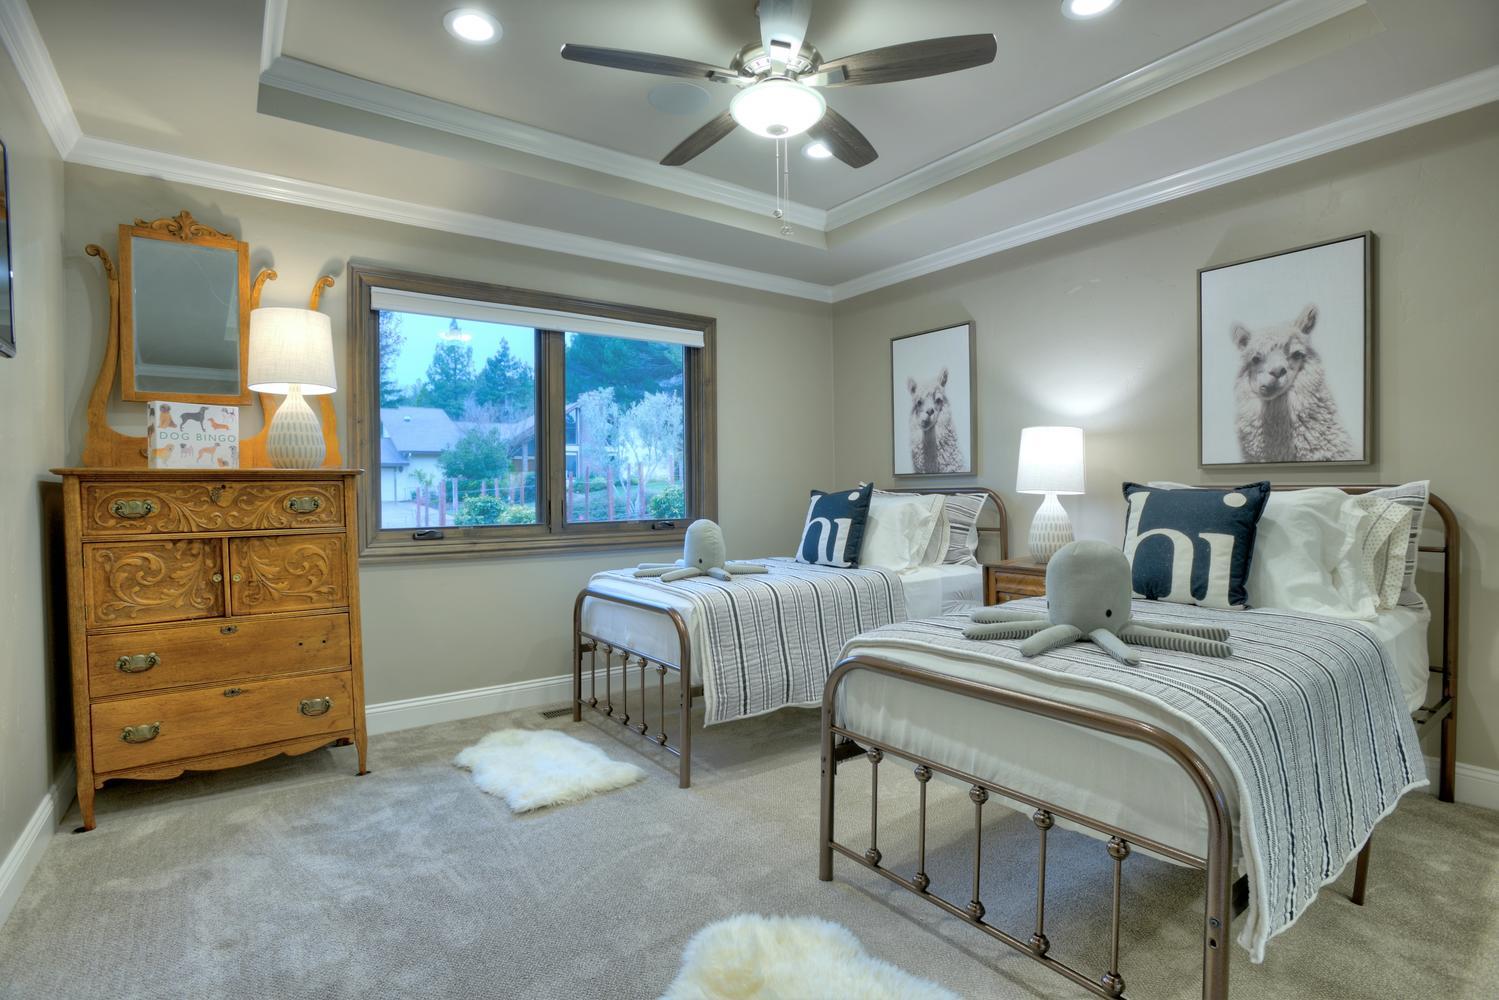 15977 Grandview Dr Monte-large-038-20-Bedroom One-1499x1000-72dpi.jpg